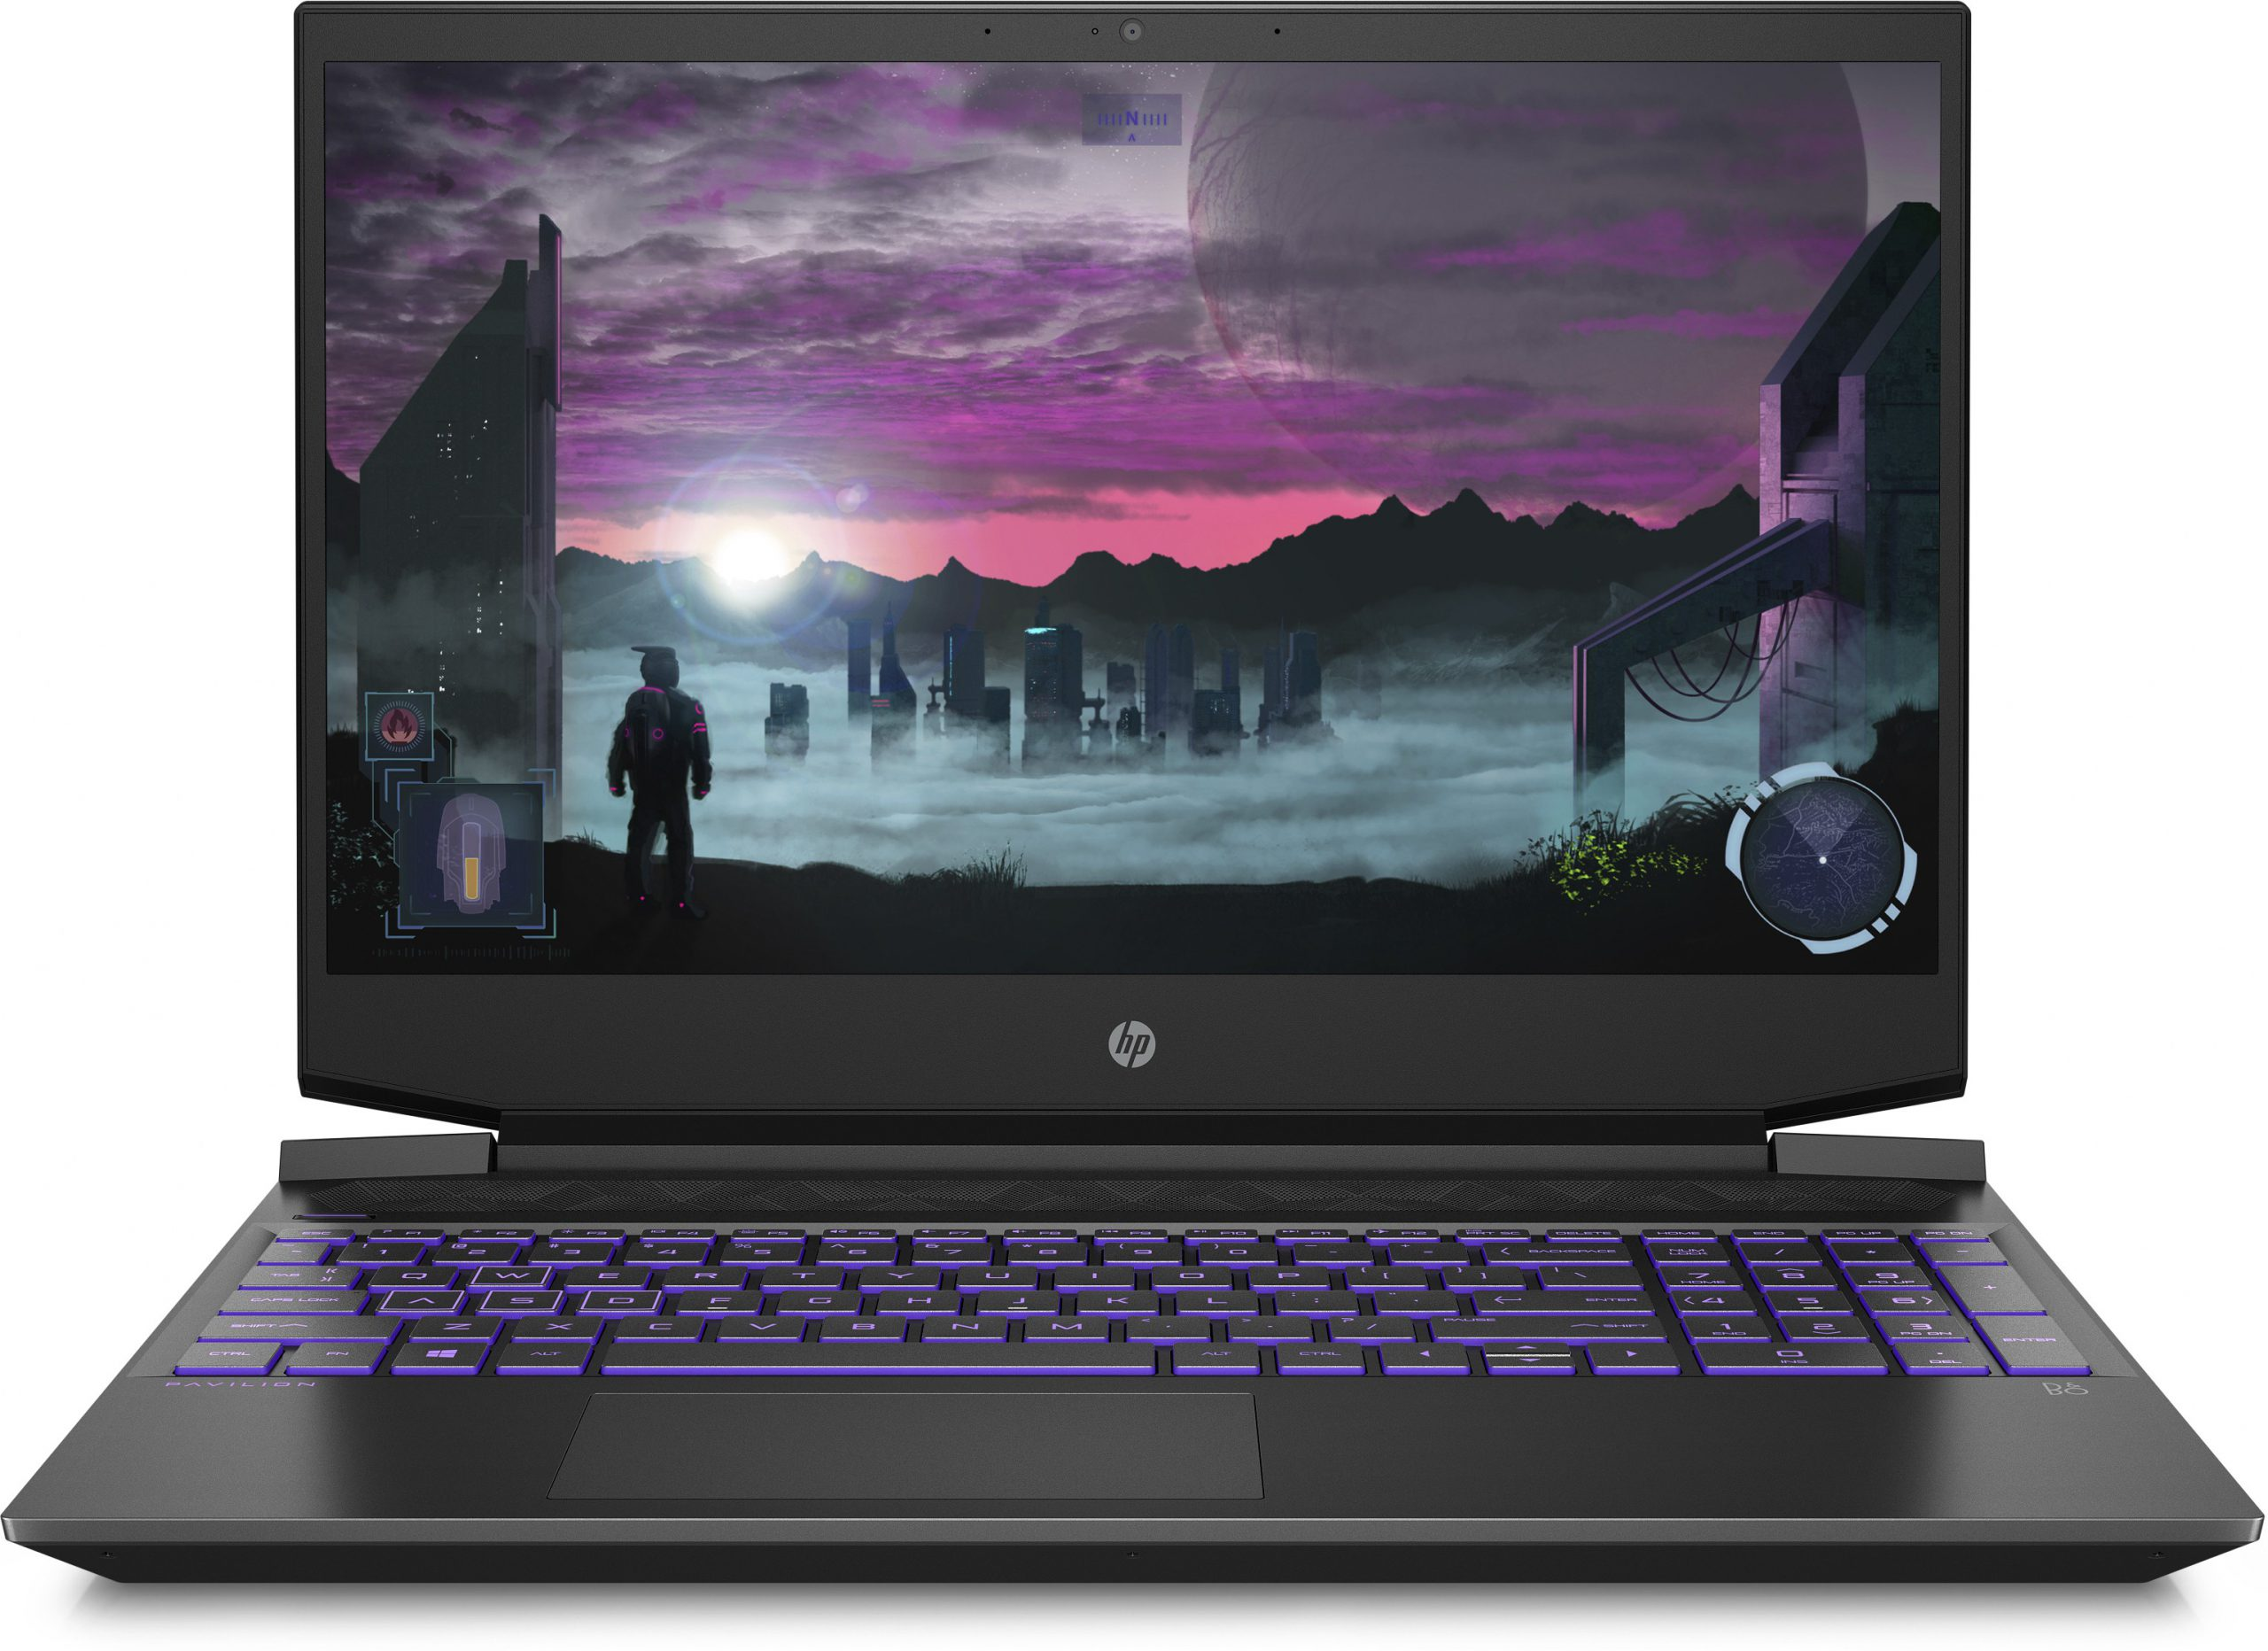 HP Pavilion Gaming 15-ec1021AX (15.6 Inch 60Hz FHD/AMD Ryzen 5 4600H/8 GB RAM/1TB HDD/Windows 10/NVIDIA GTX 1650 4GB Graphics)